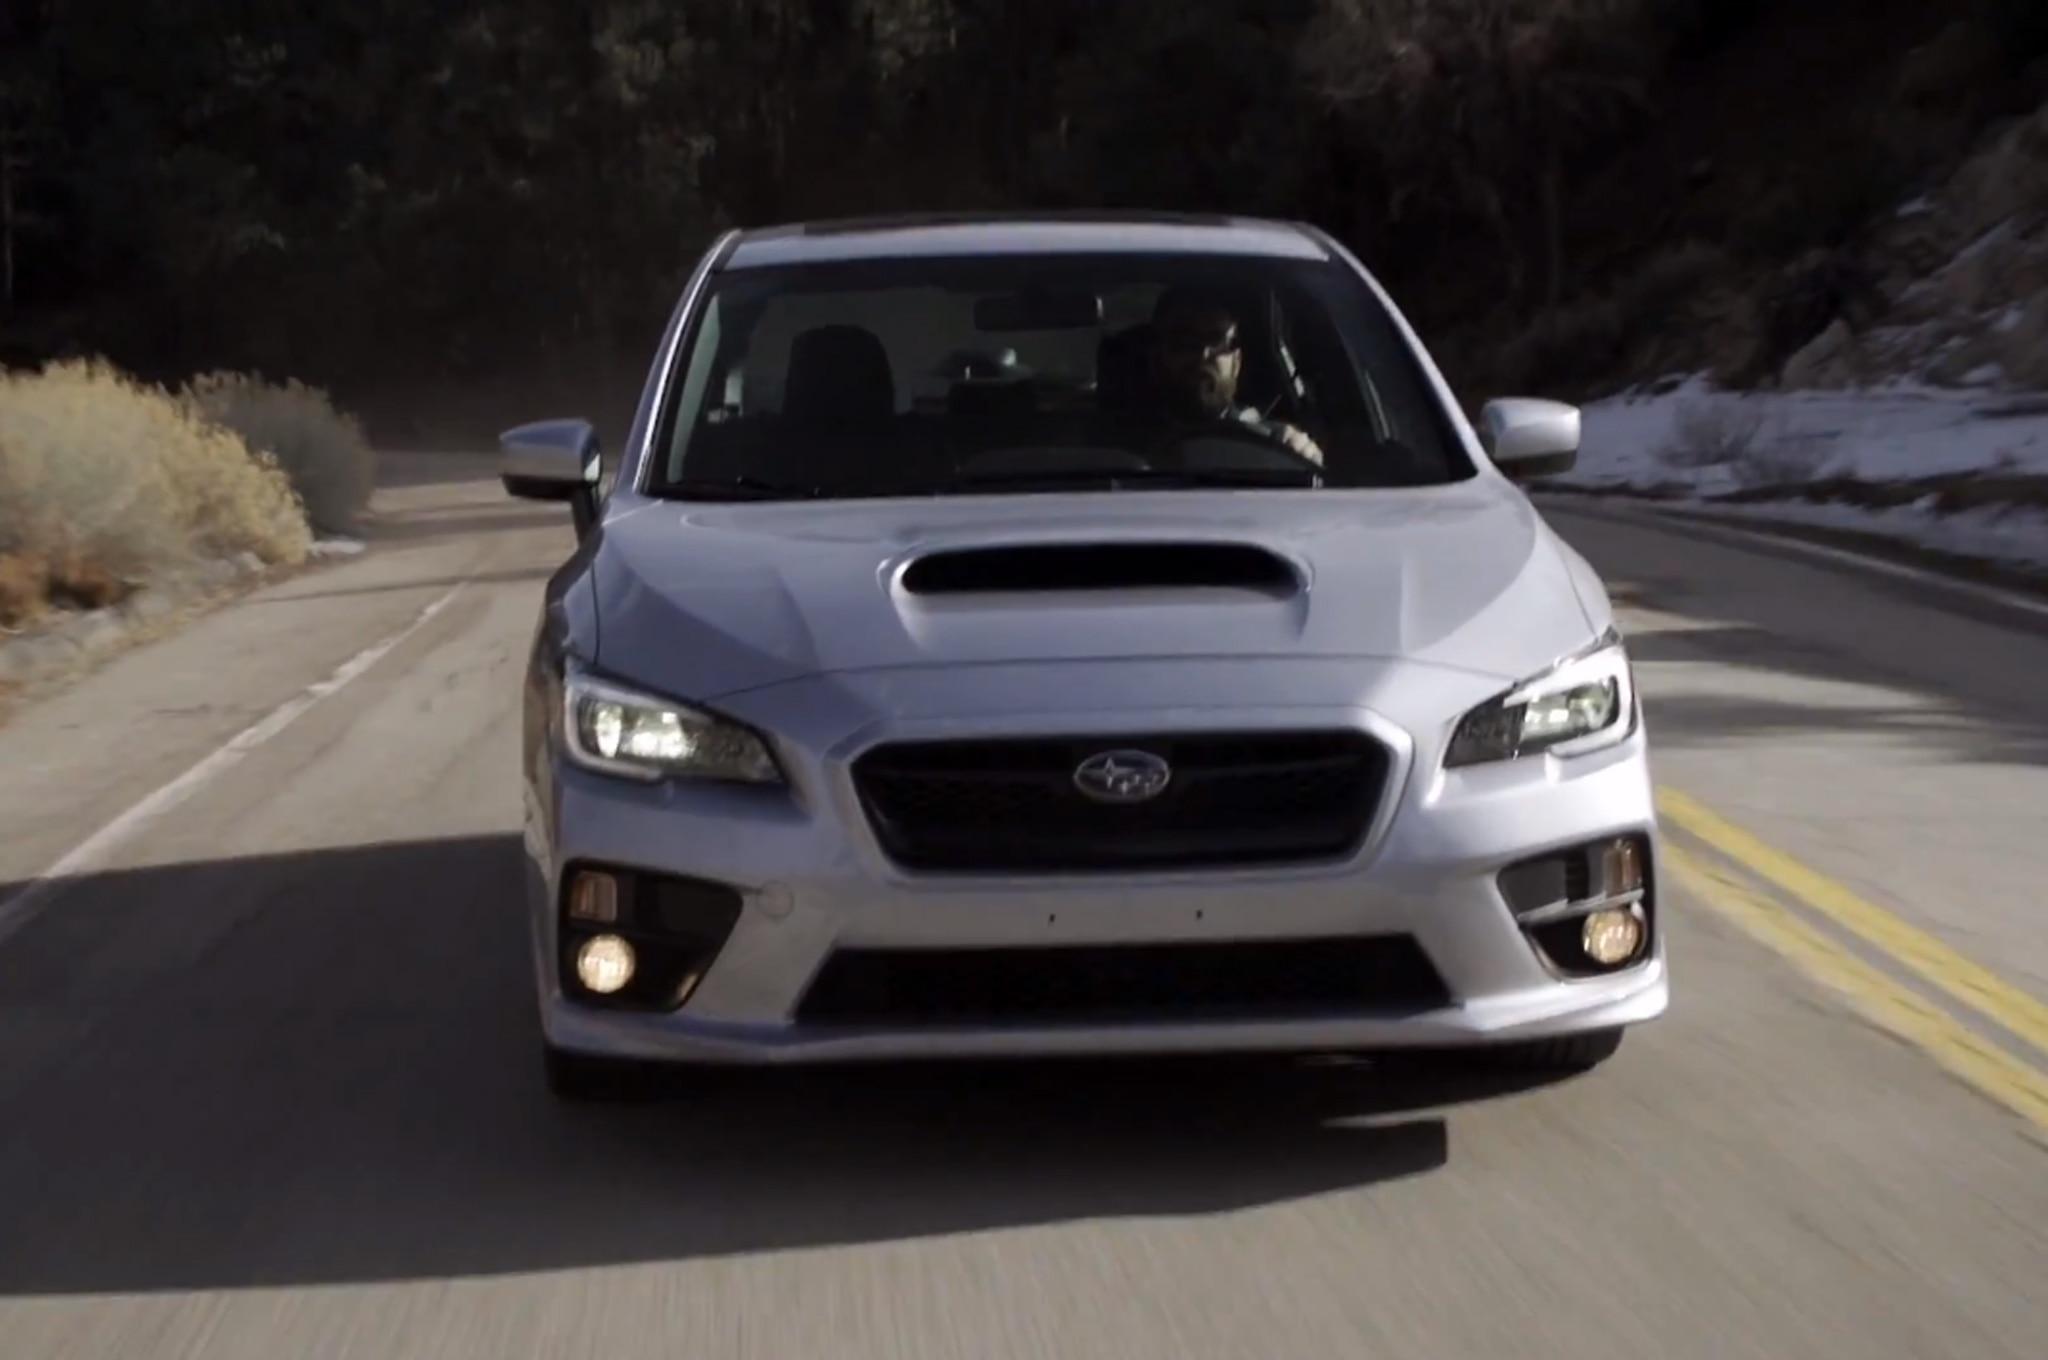 2015 Subaru Wrx Front Video Grab1